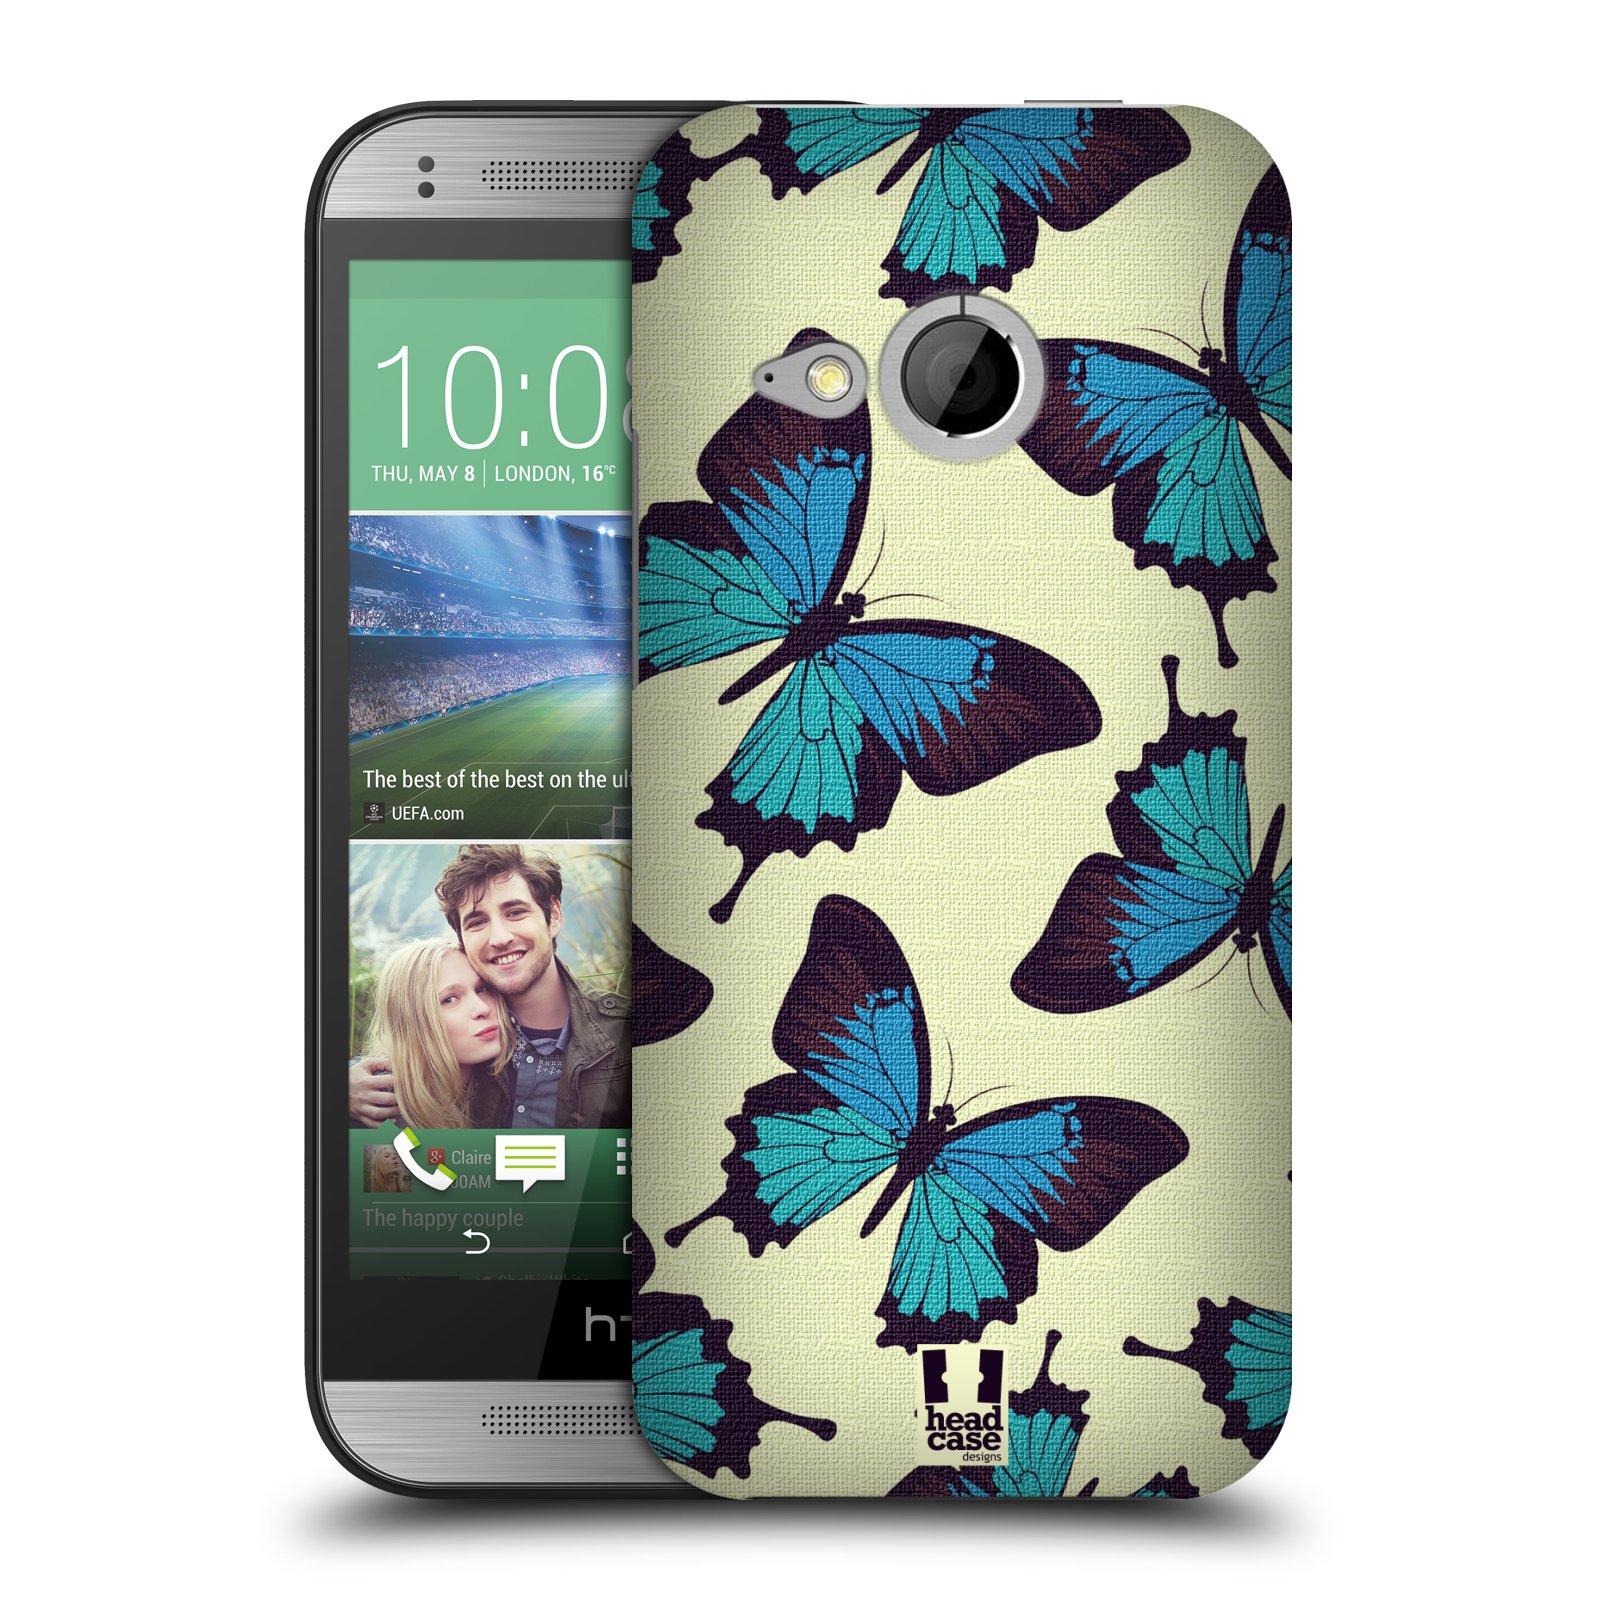 HEAD CASE DESIGNS BUTTERFLY PATTERN HARD BACK CASE FOR HTC ONE MINI 2